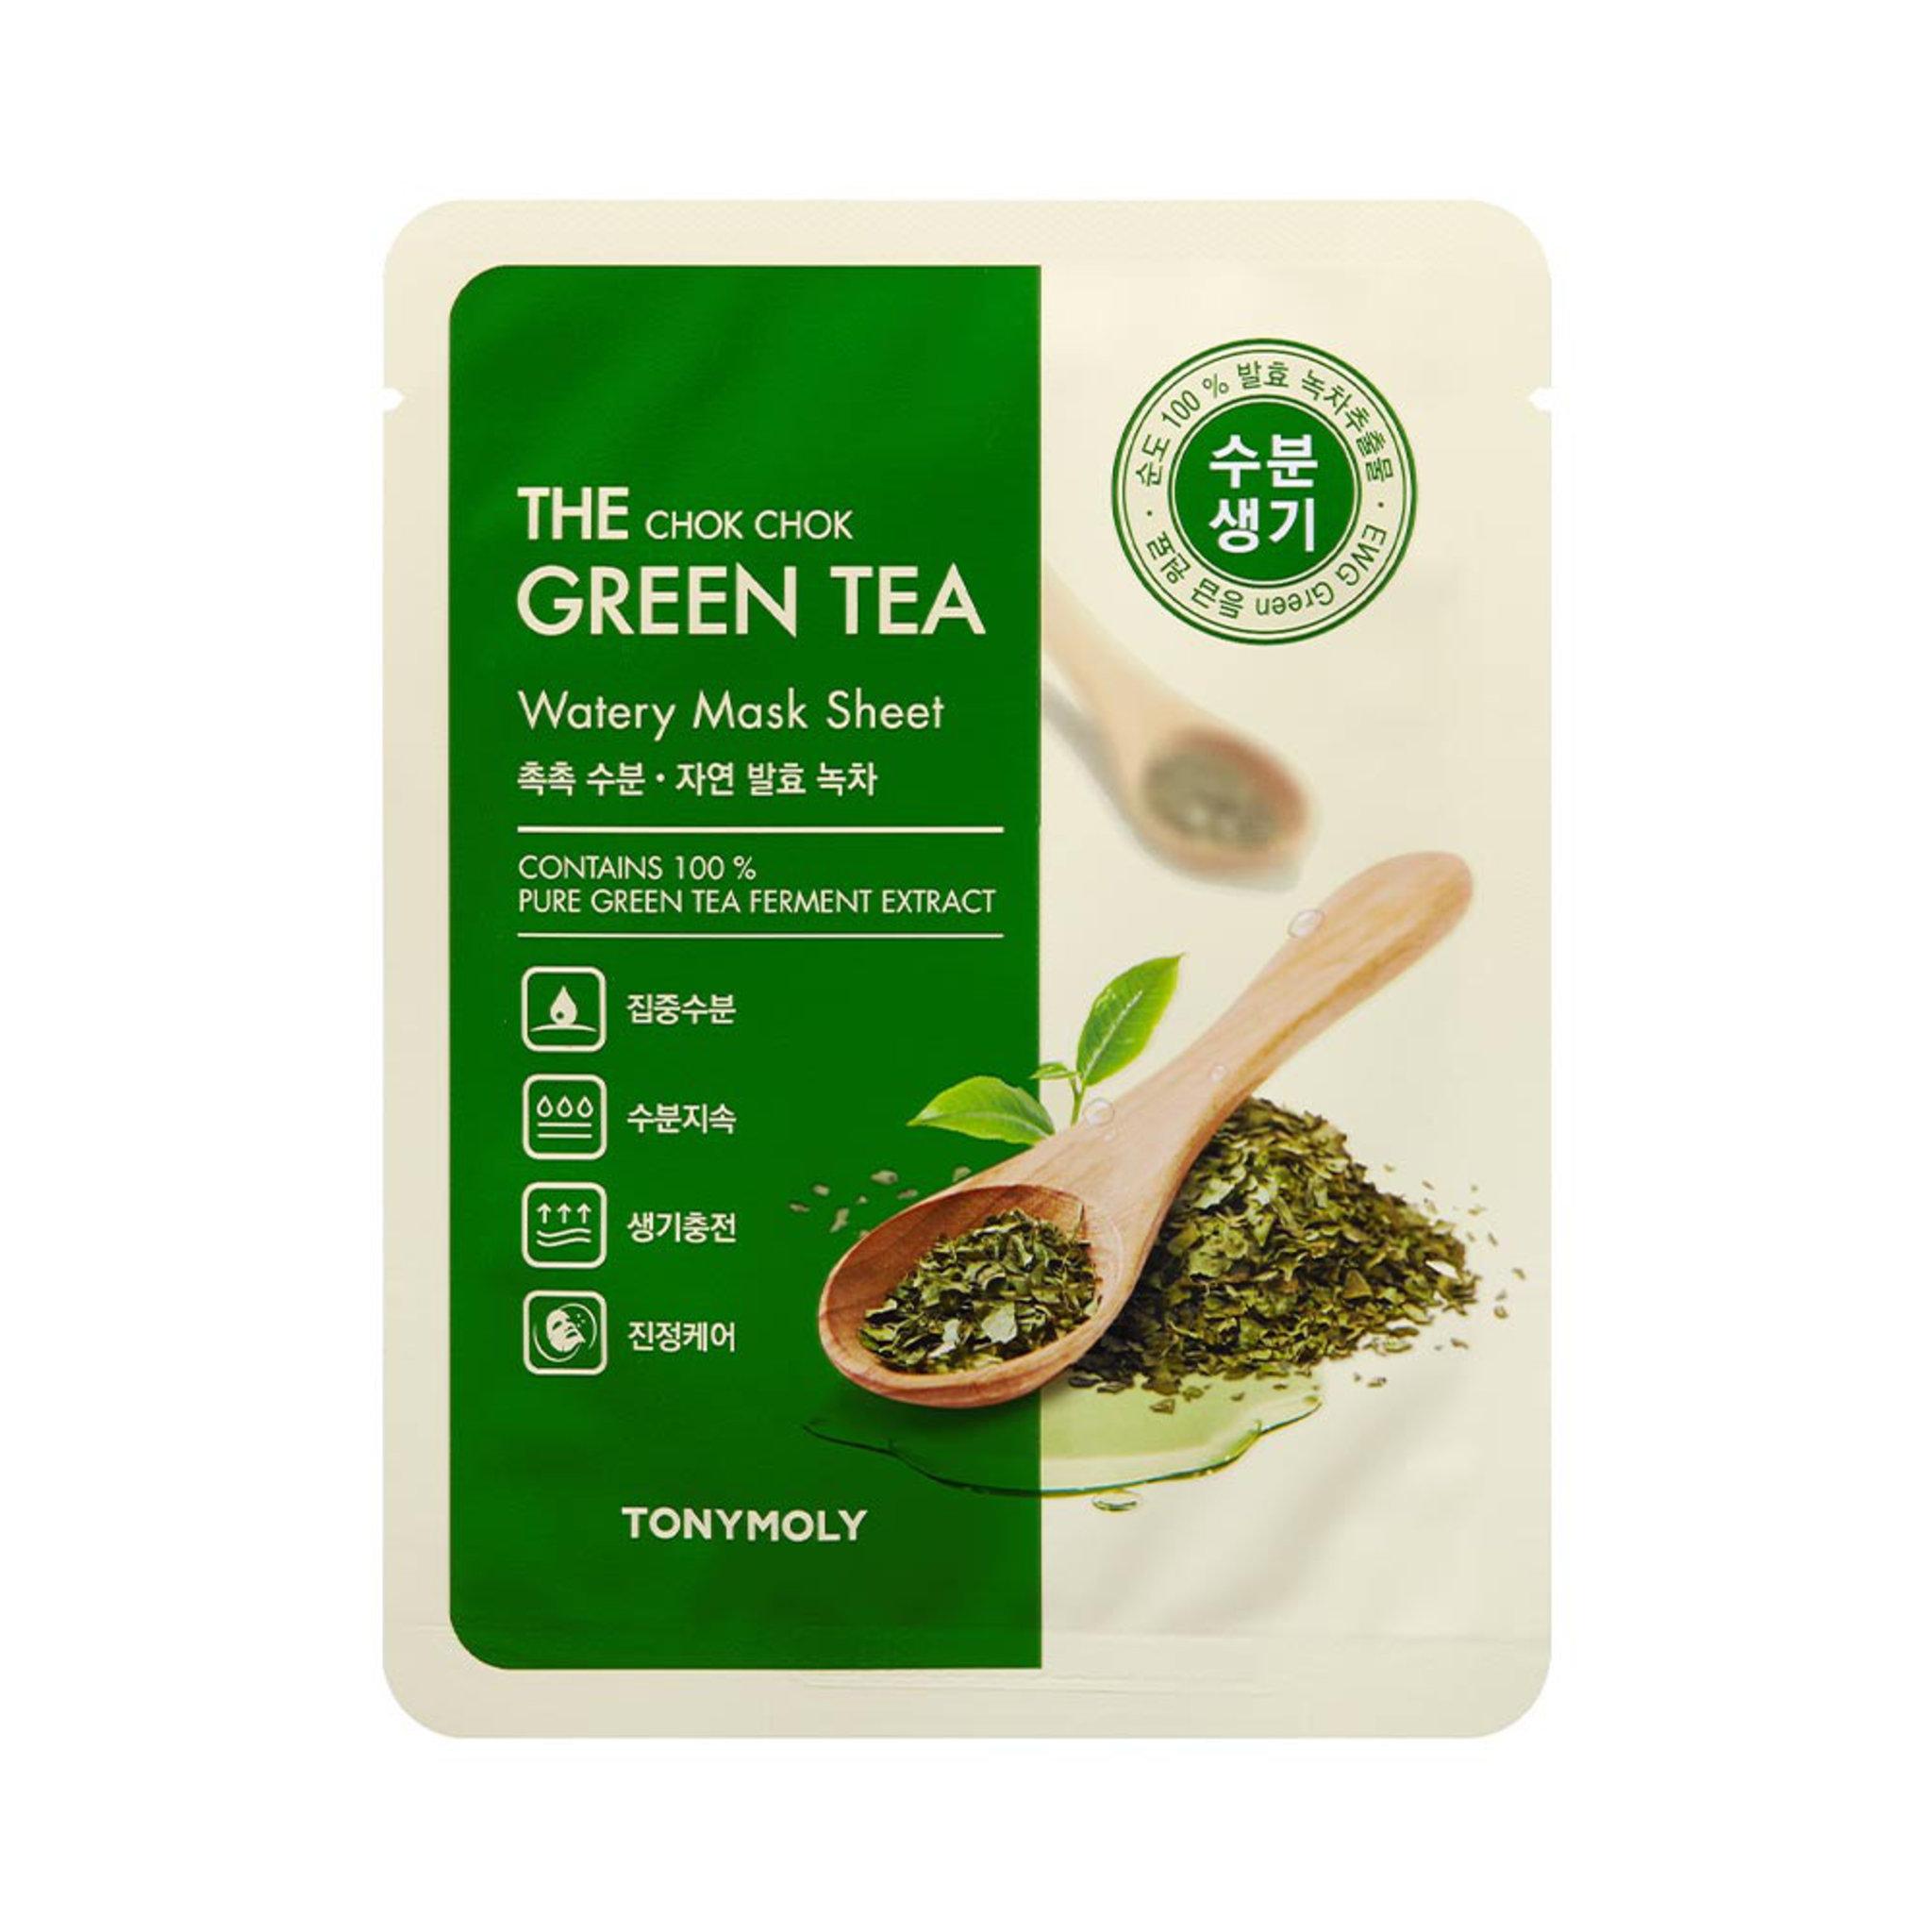 The Chock Chok Green Tea Watery Mask Sheet